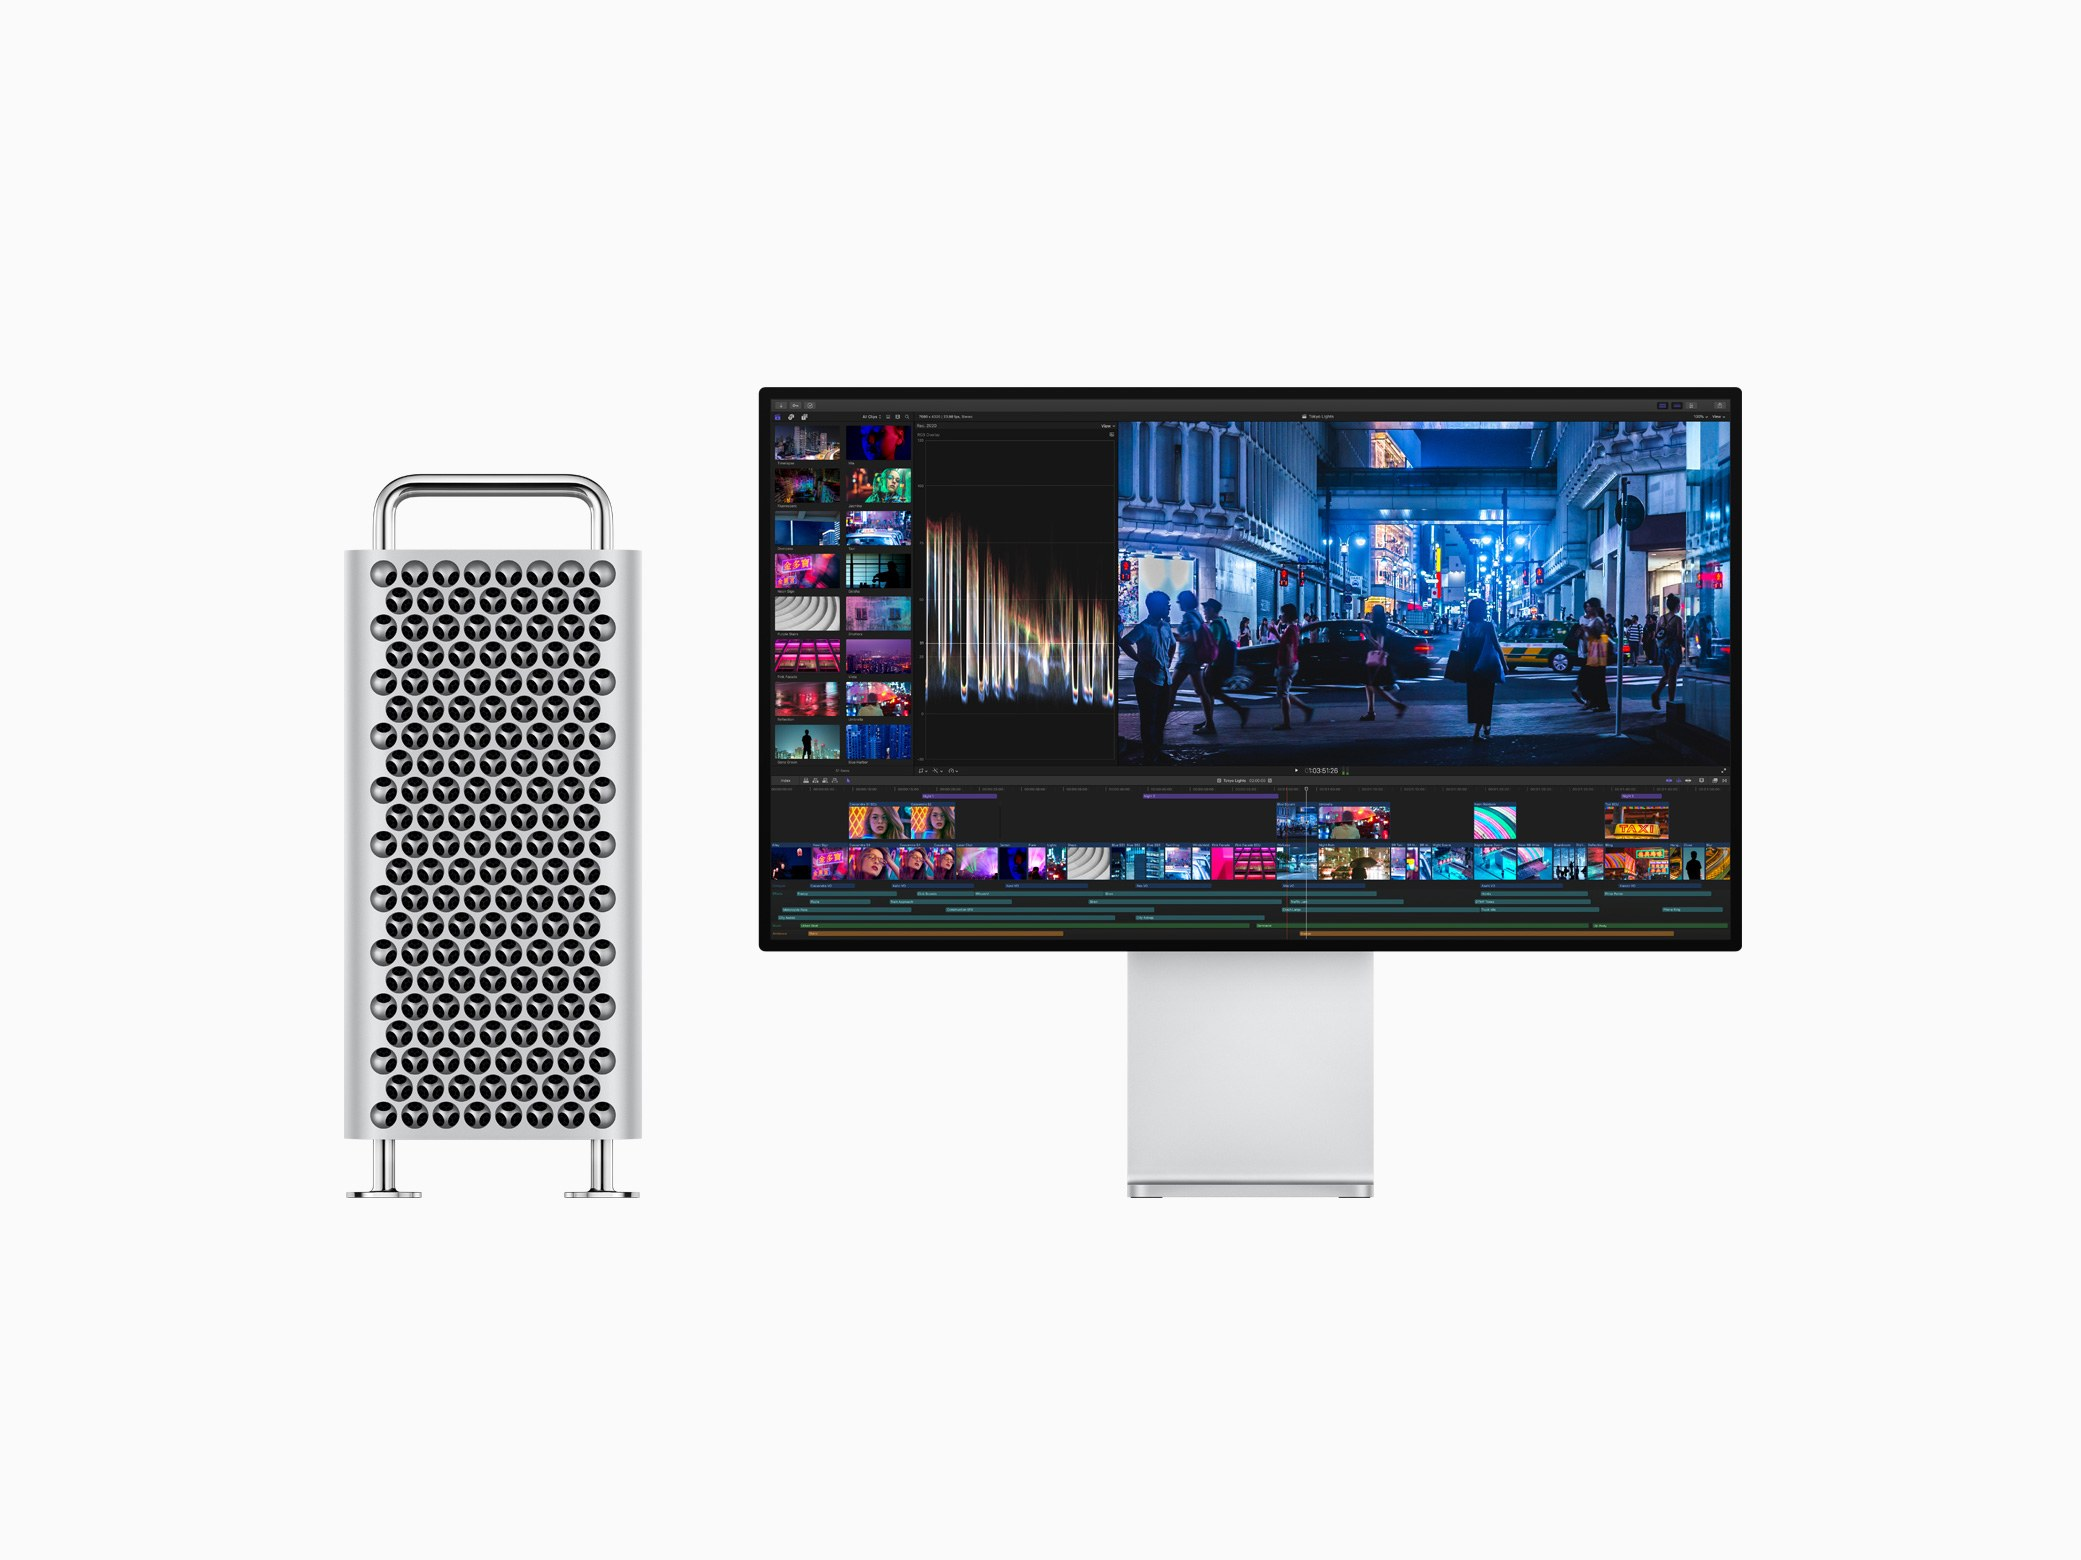 Apple Mac Pro (2019): Specs, Features, Release Date.